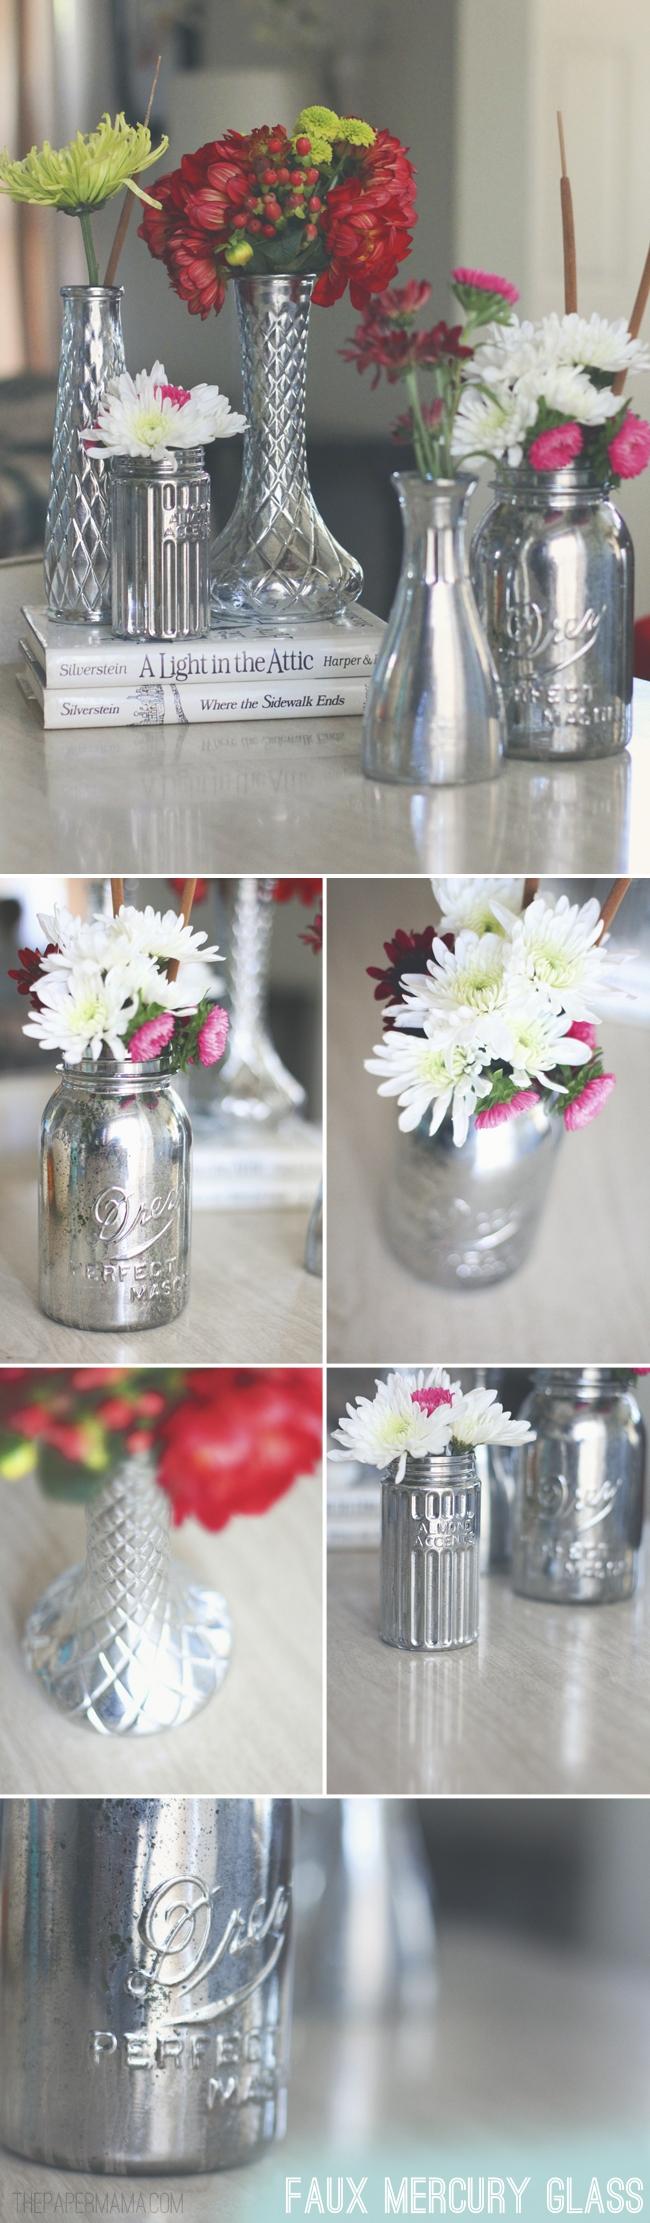 Mirror paint vases tutorial